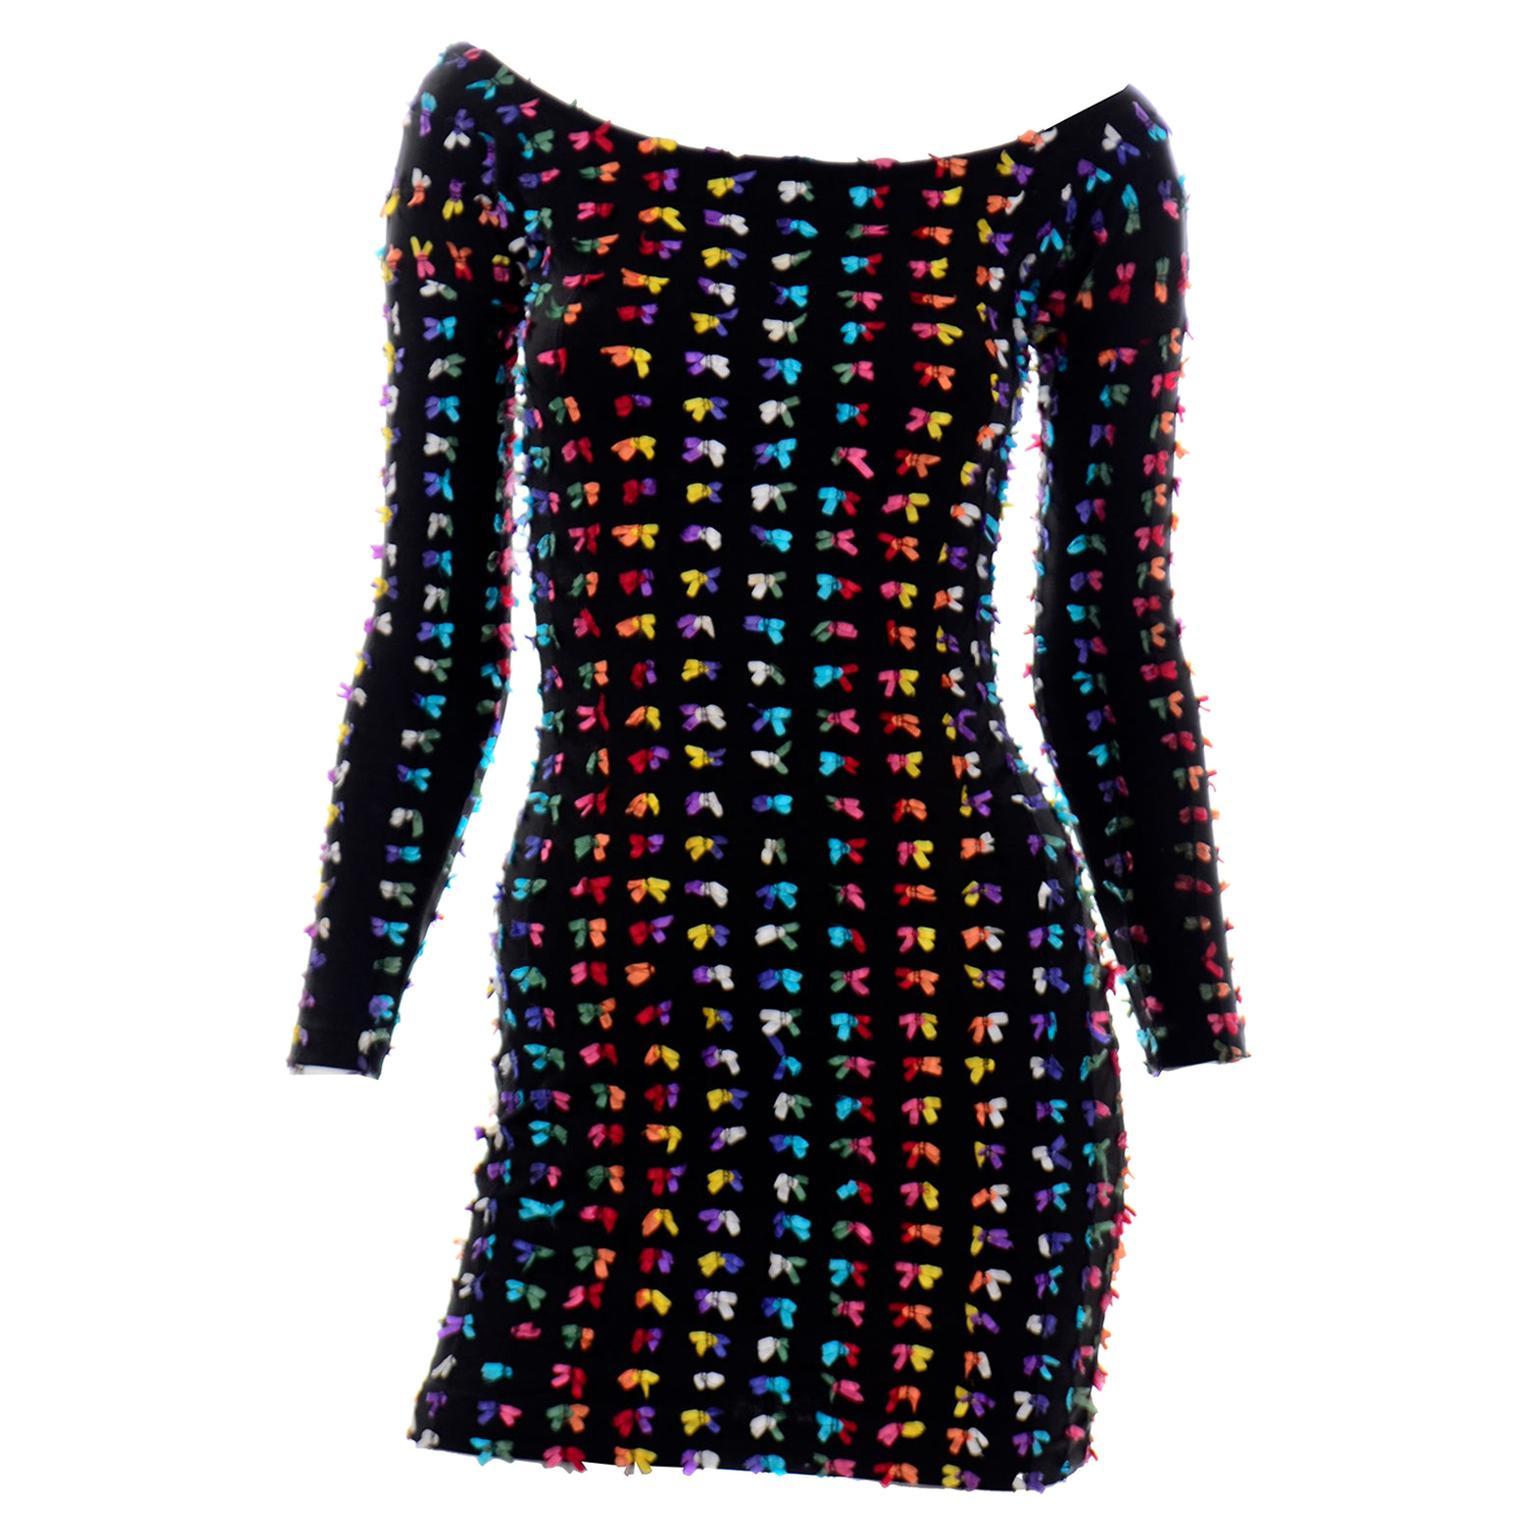 Betsey Johnson Vintage Punk Label Bodycon Stretch Mini Dress W Rainbow Bows